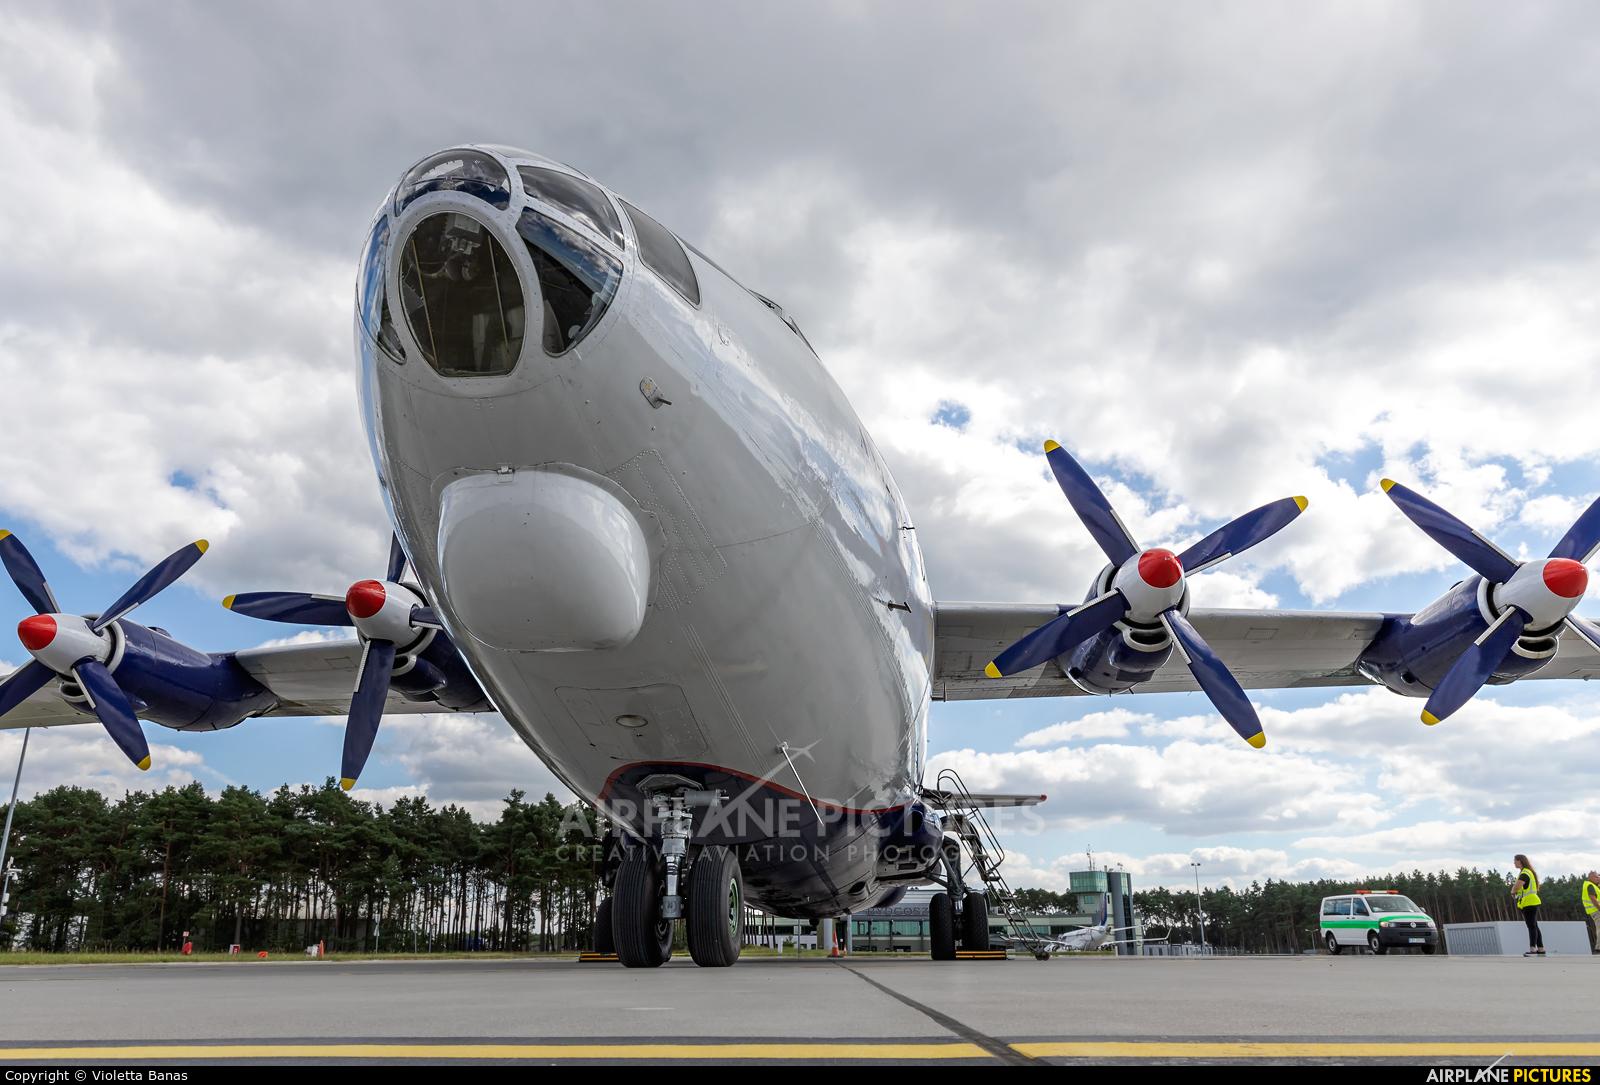 Ruby Star Air Enterprise EW-275TI aircraft at Bydgoszcz - Szwederowo